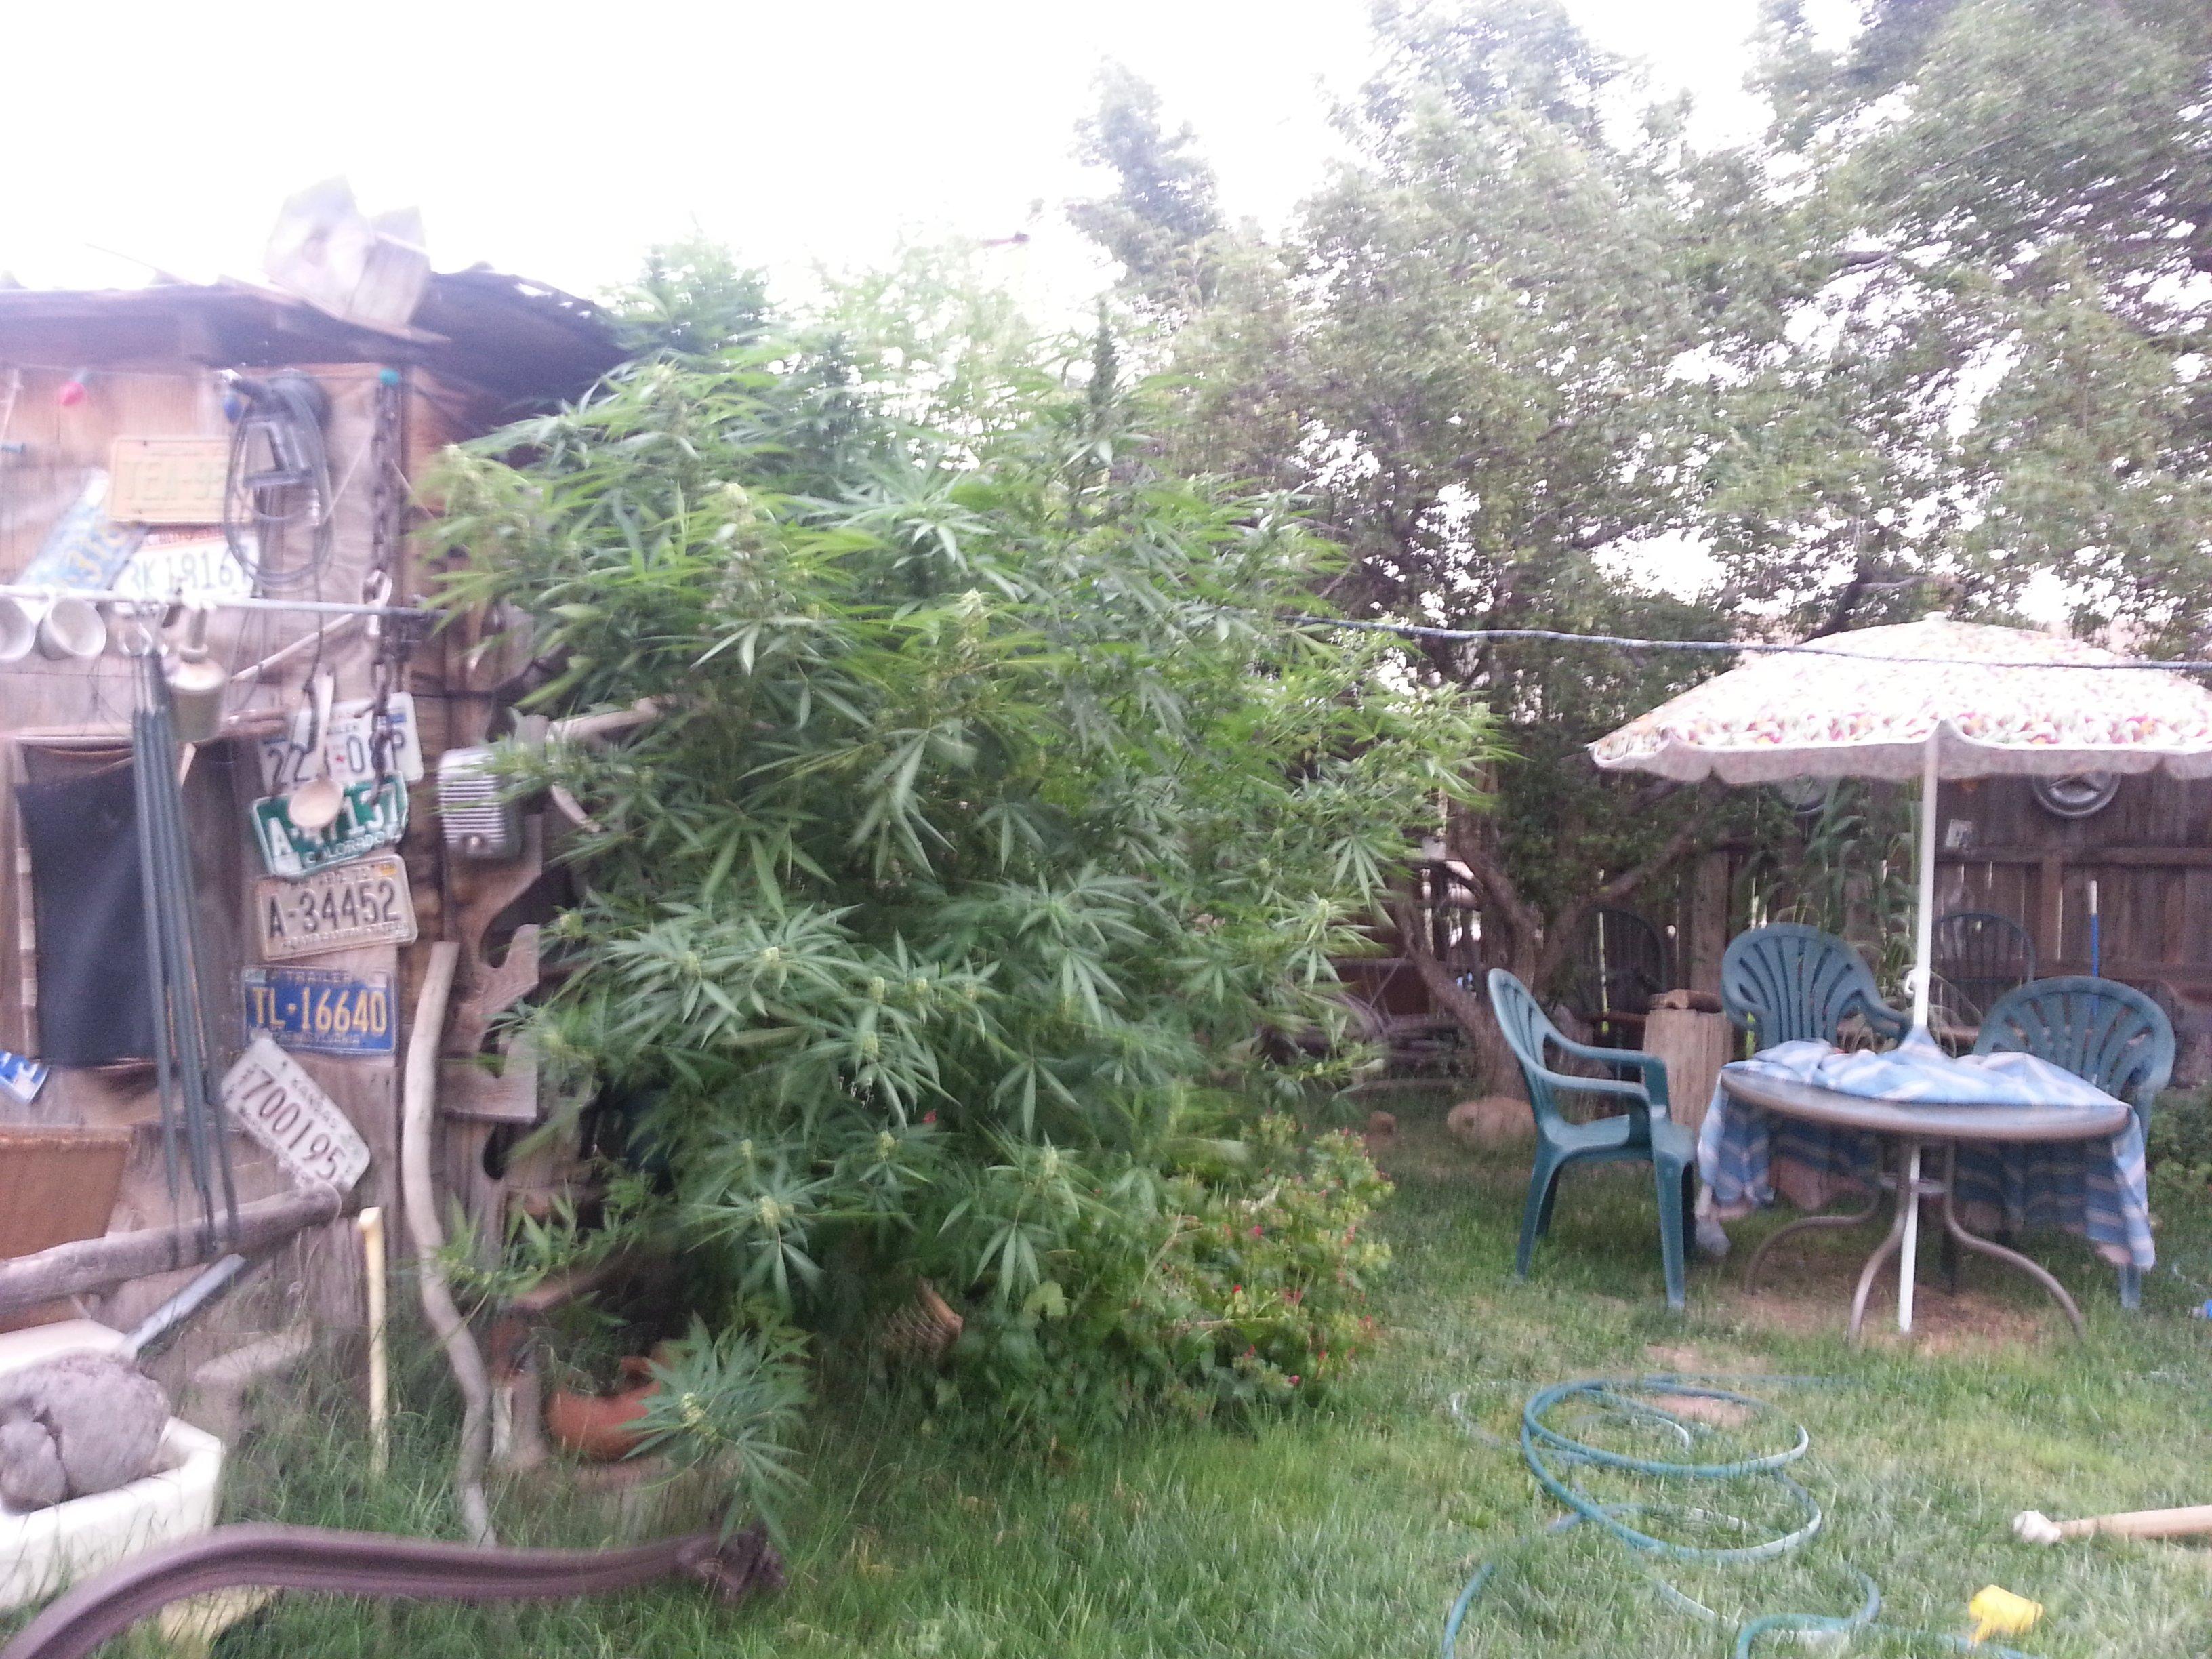 Authorities dismantle 2 marijuana growing operations in Holbrook  CBS